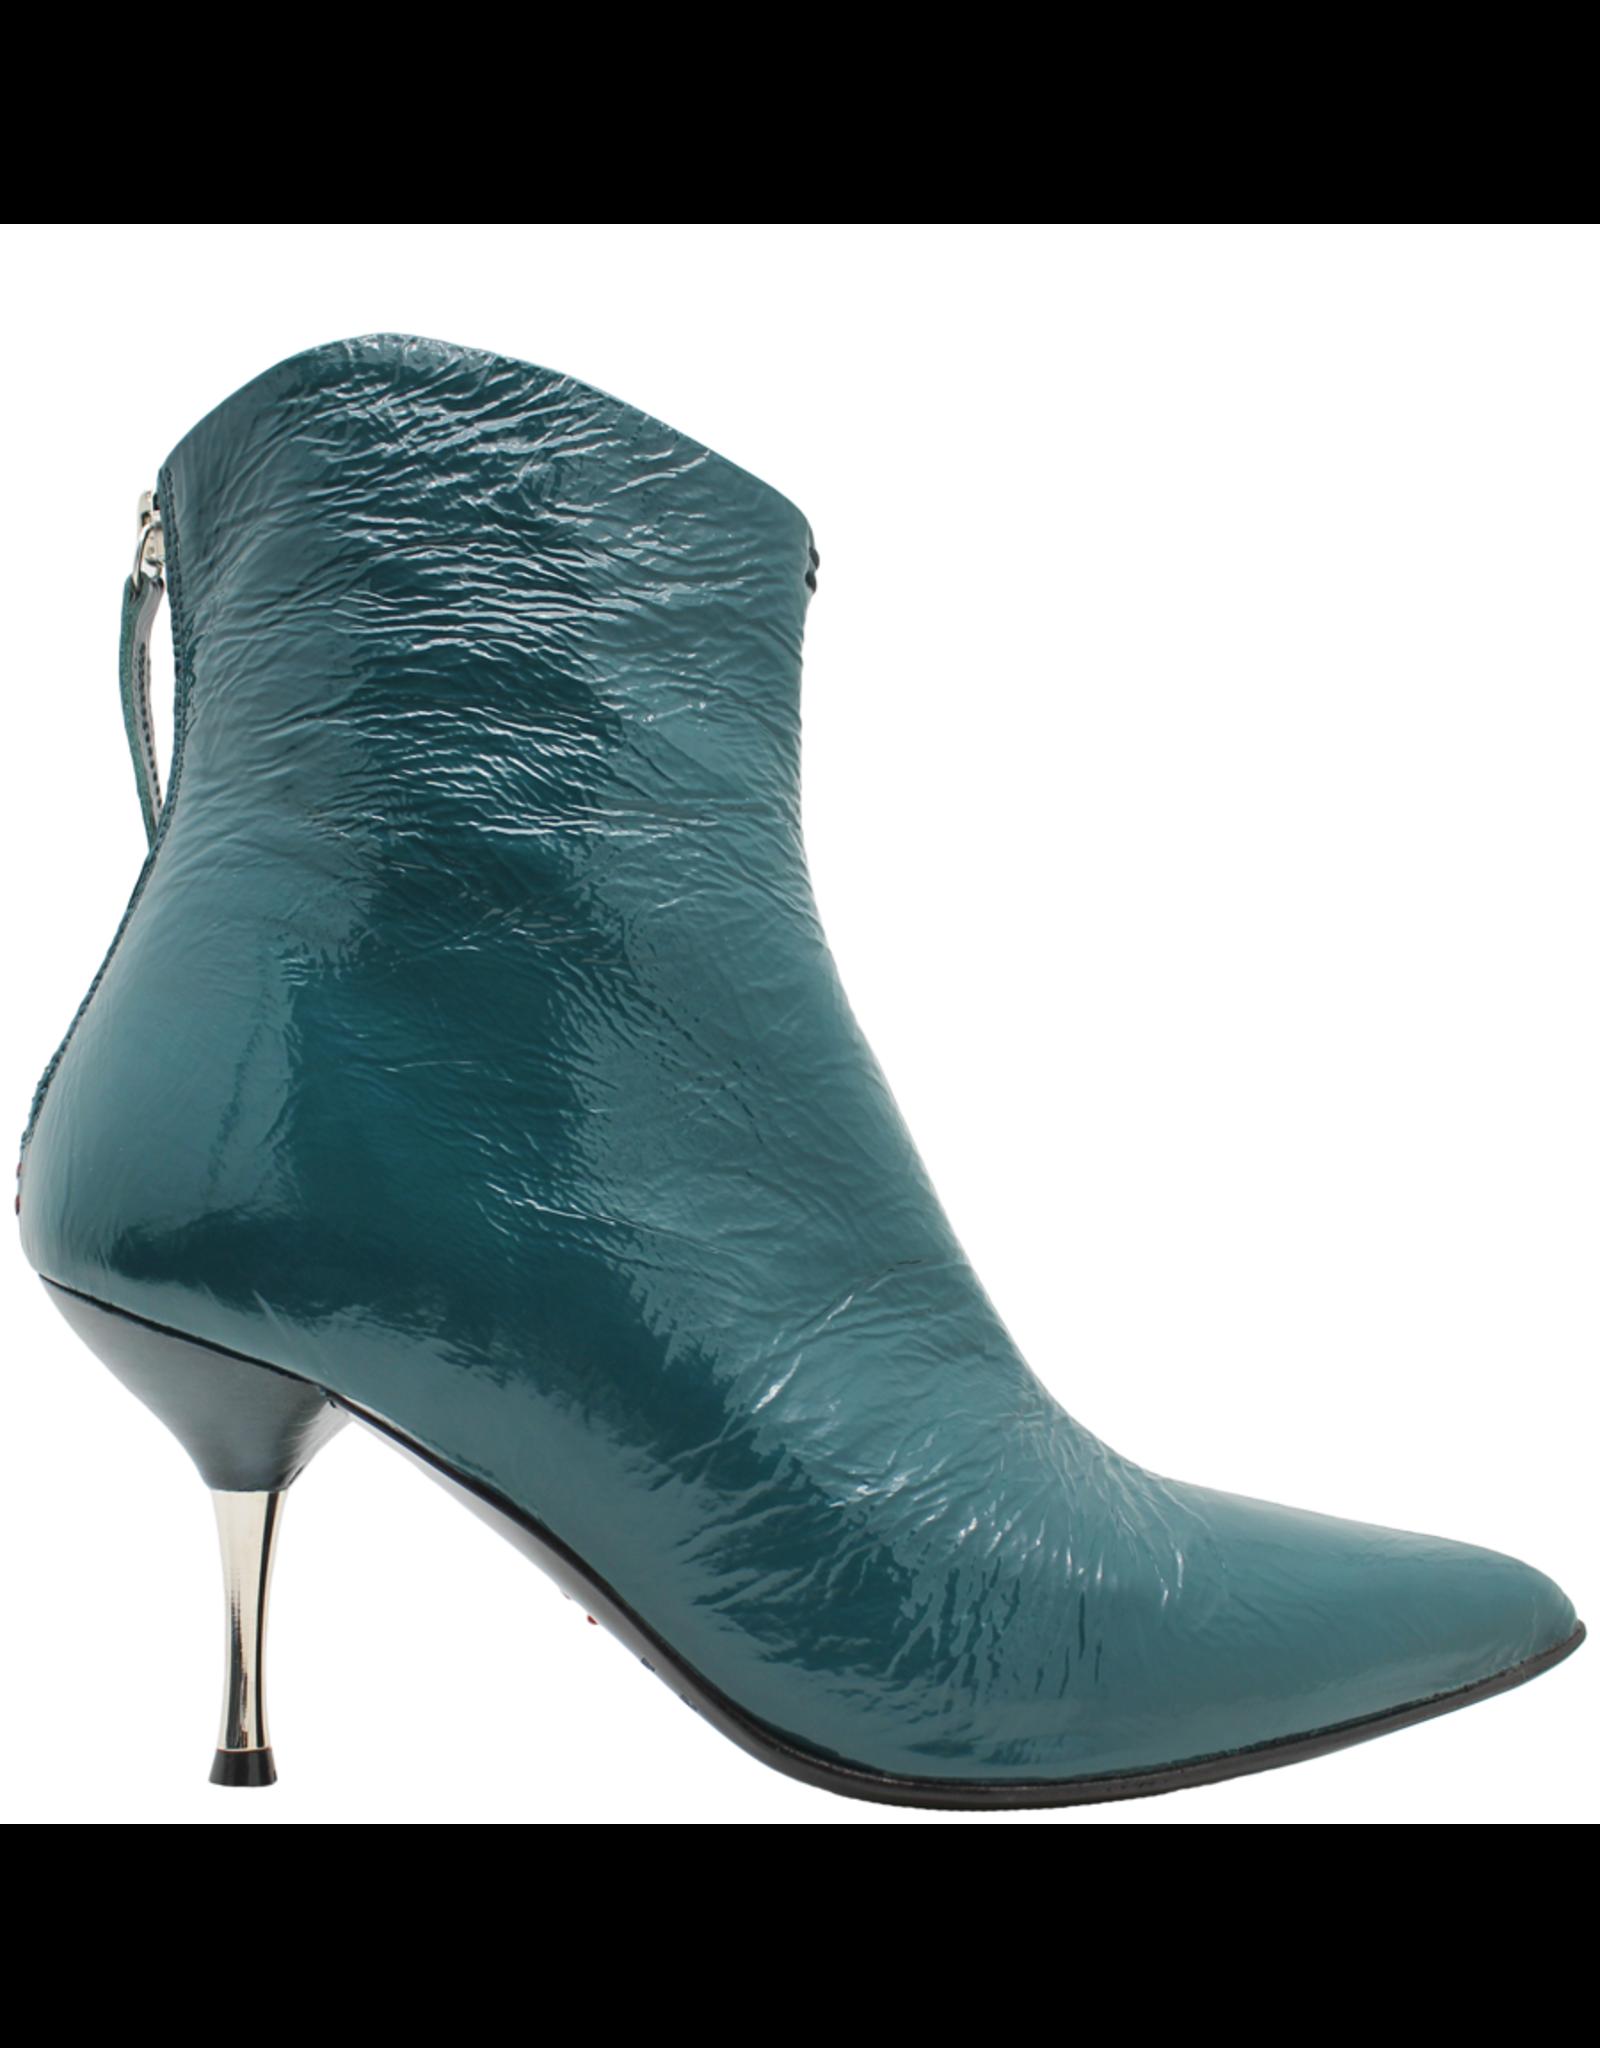 Halmanera Halmanera Teal Patent Boot  1996